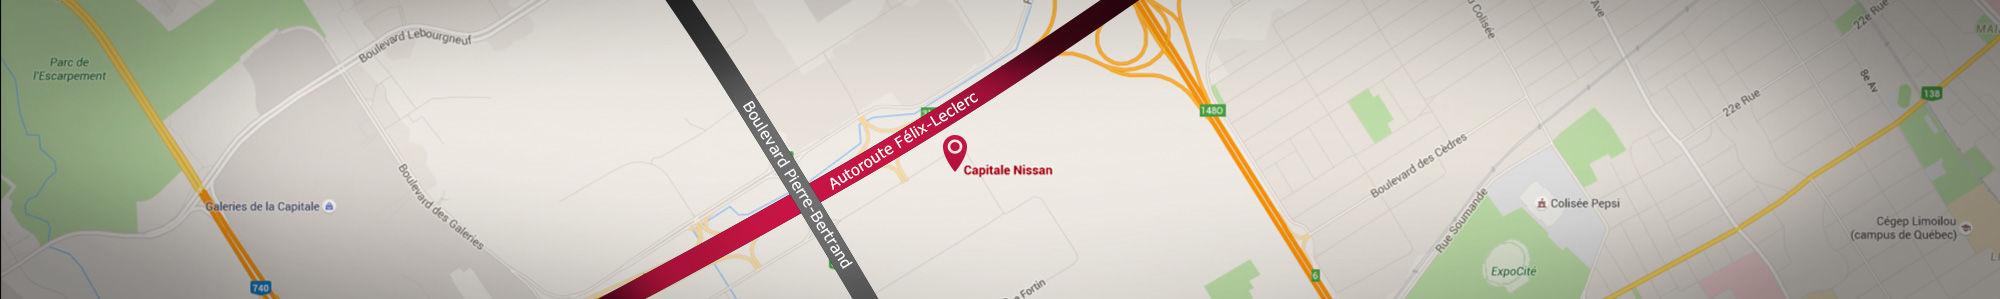 Capitale Nissan | Google